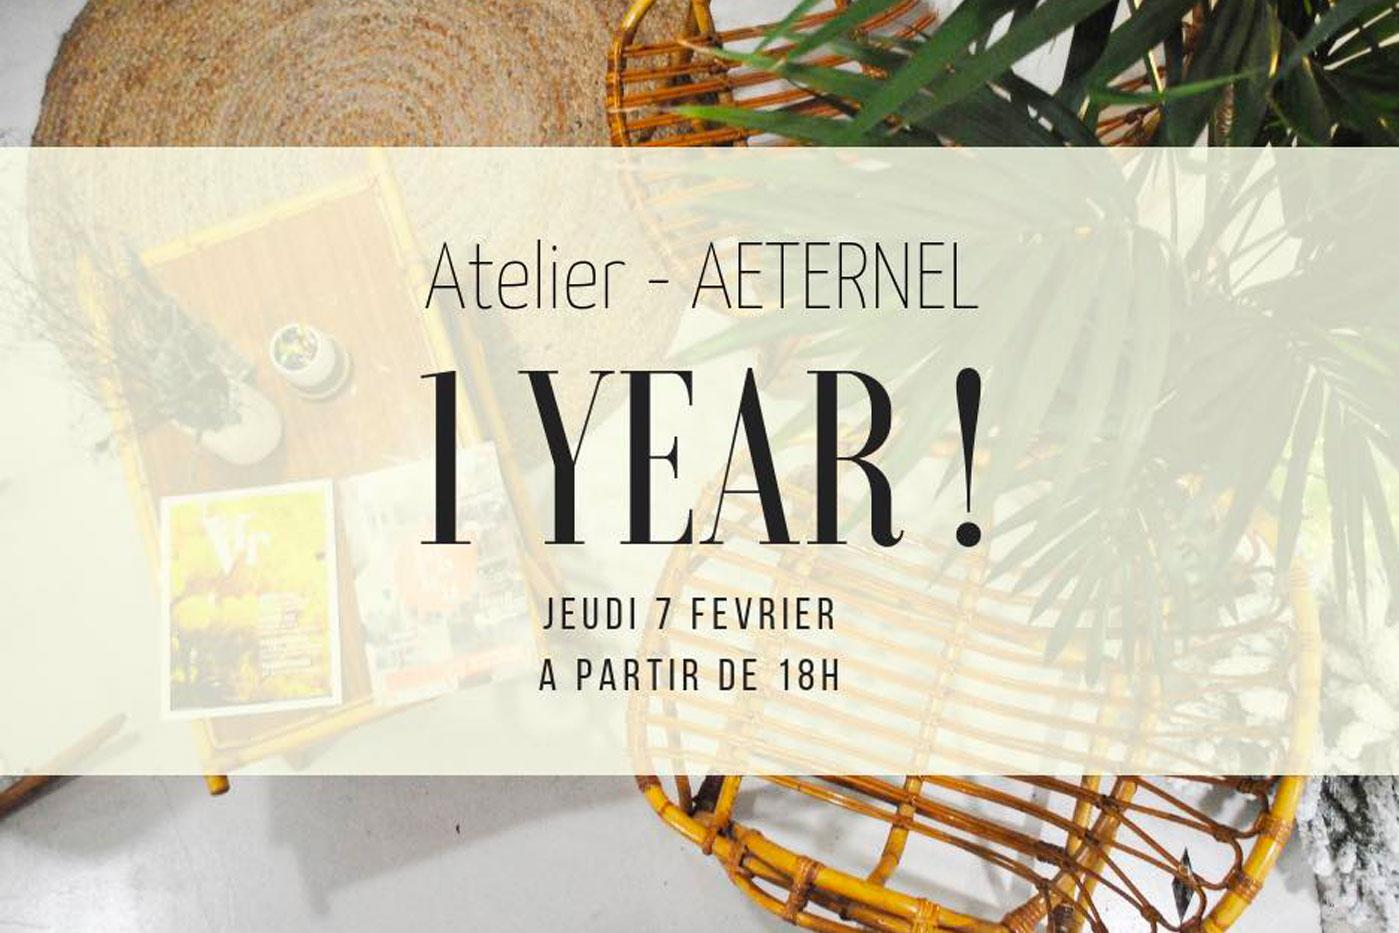 Atelier Aeternel anniversaire